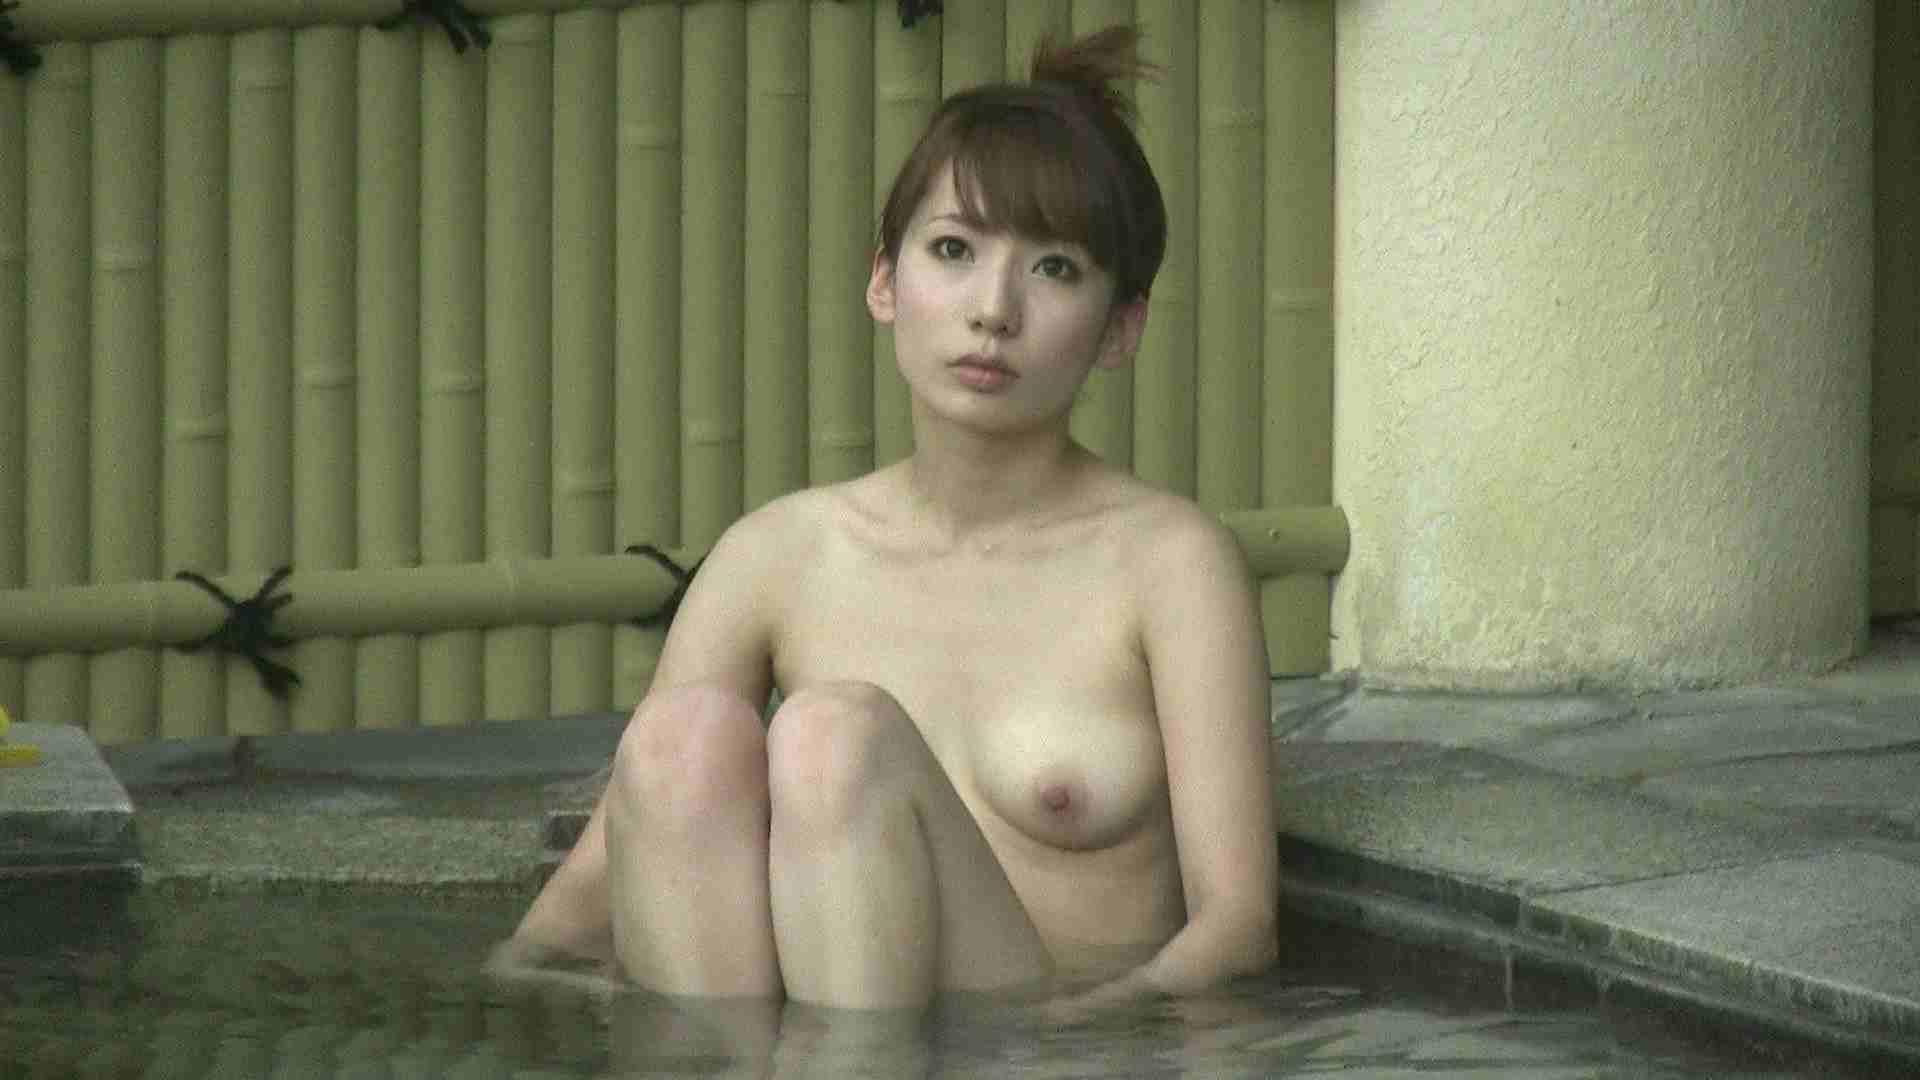 Aquaな露天風呂Vol.208 露天風呂編  103PIX 88